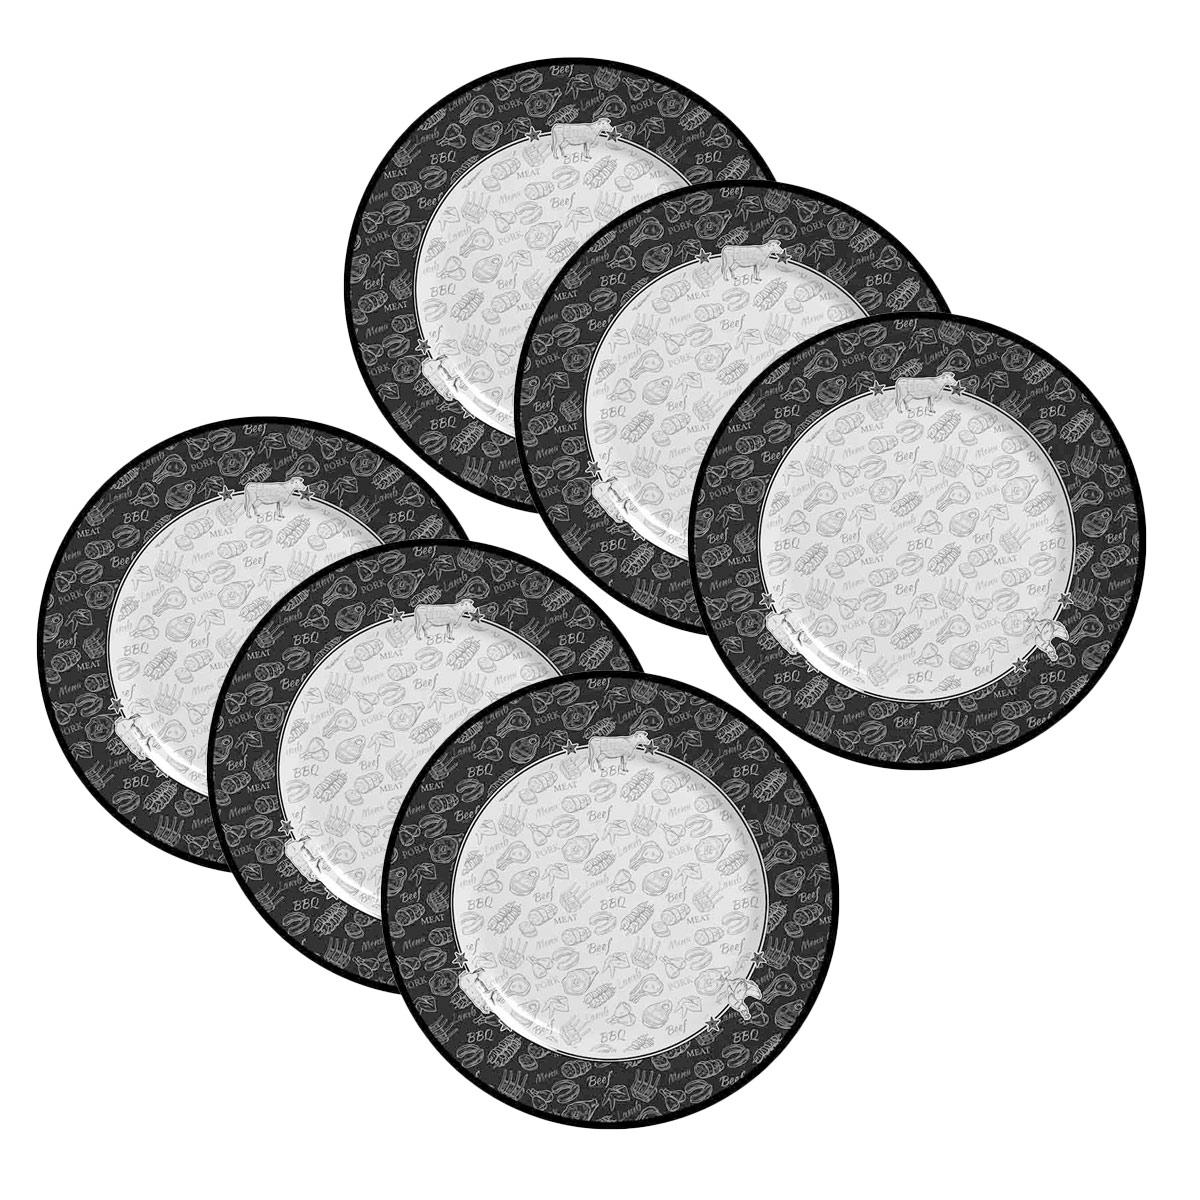 Jogo de 6 Pratos de Sobremesa Alleanza Barbecue 2ª Linha  - Lemis